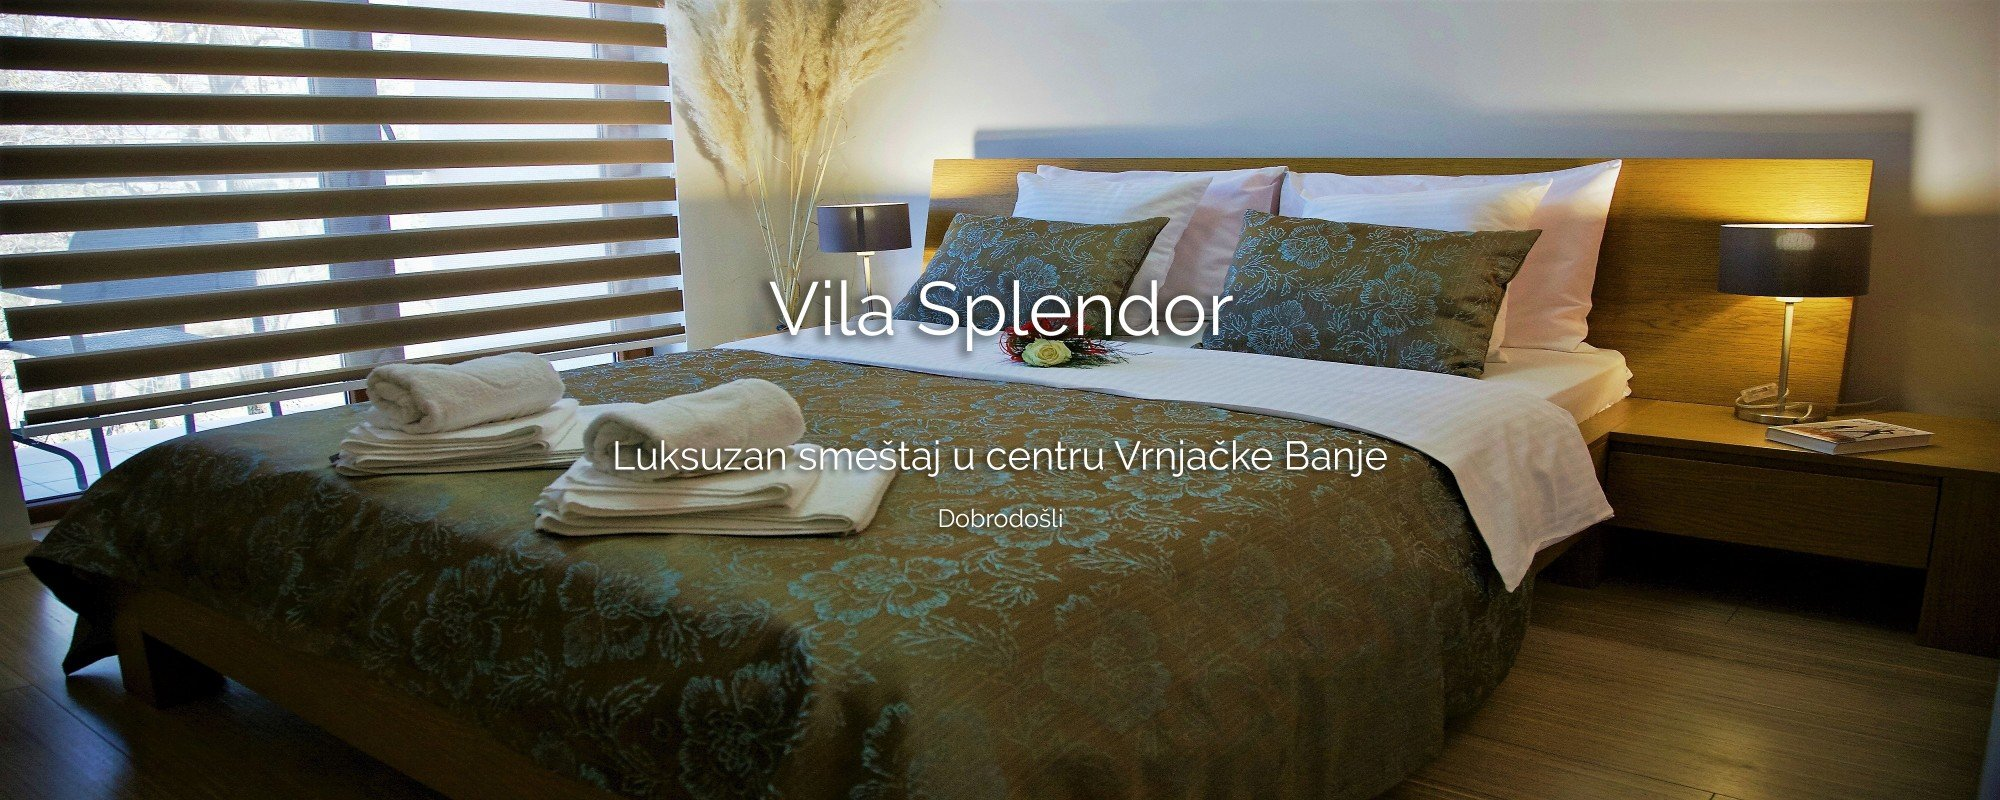 Vila Splendor slika apartmana